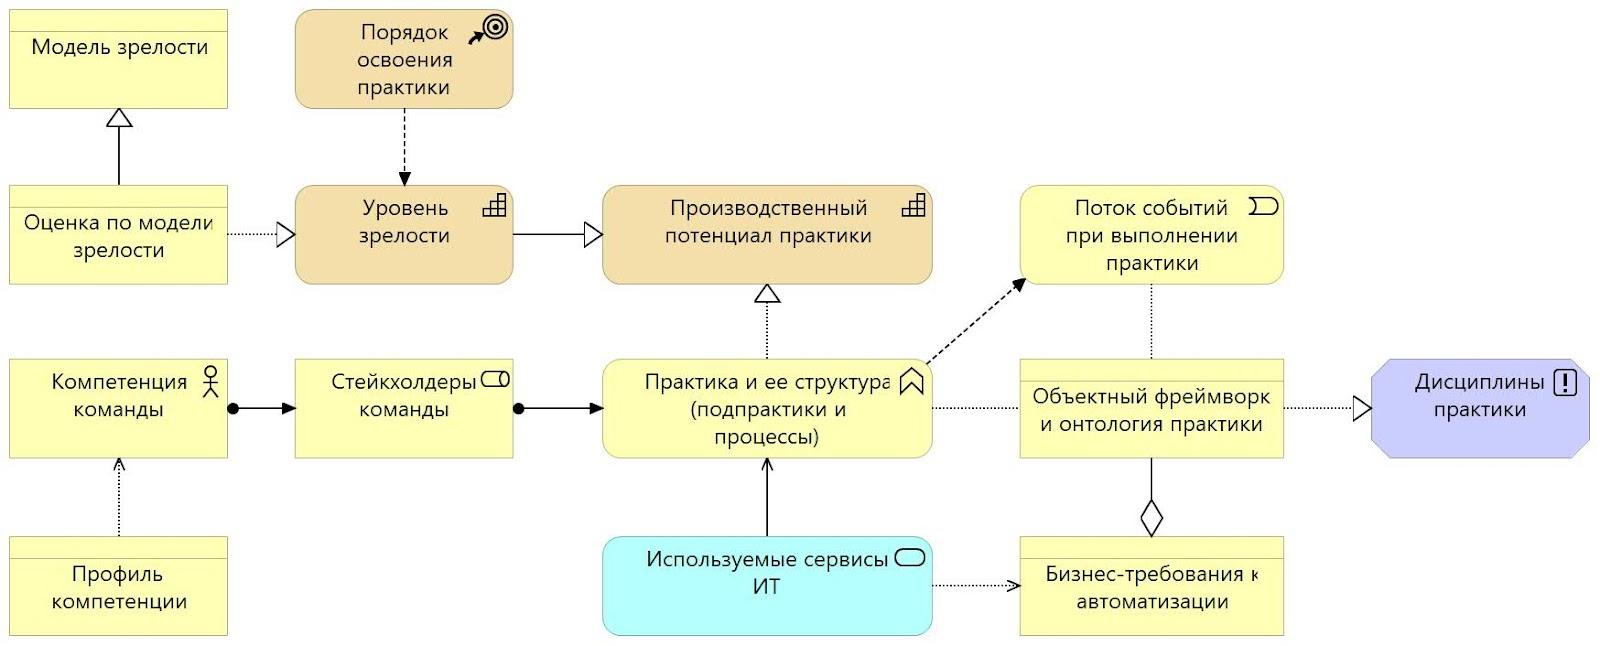 practice meta model.jpg